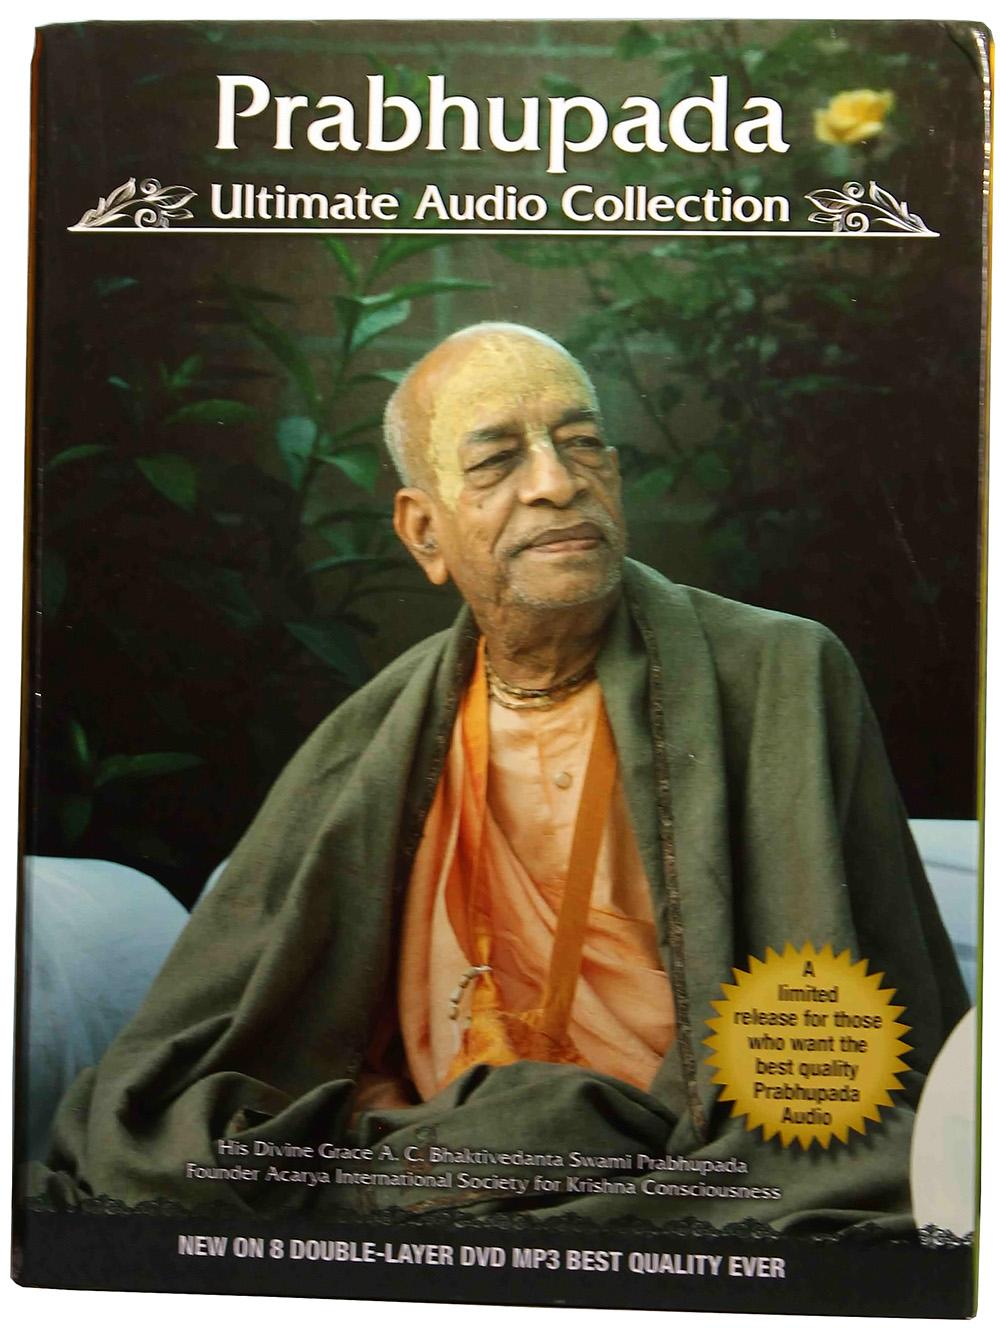 Prabhupada-ultimate-audio-collection-box